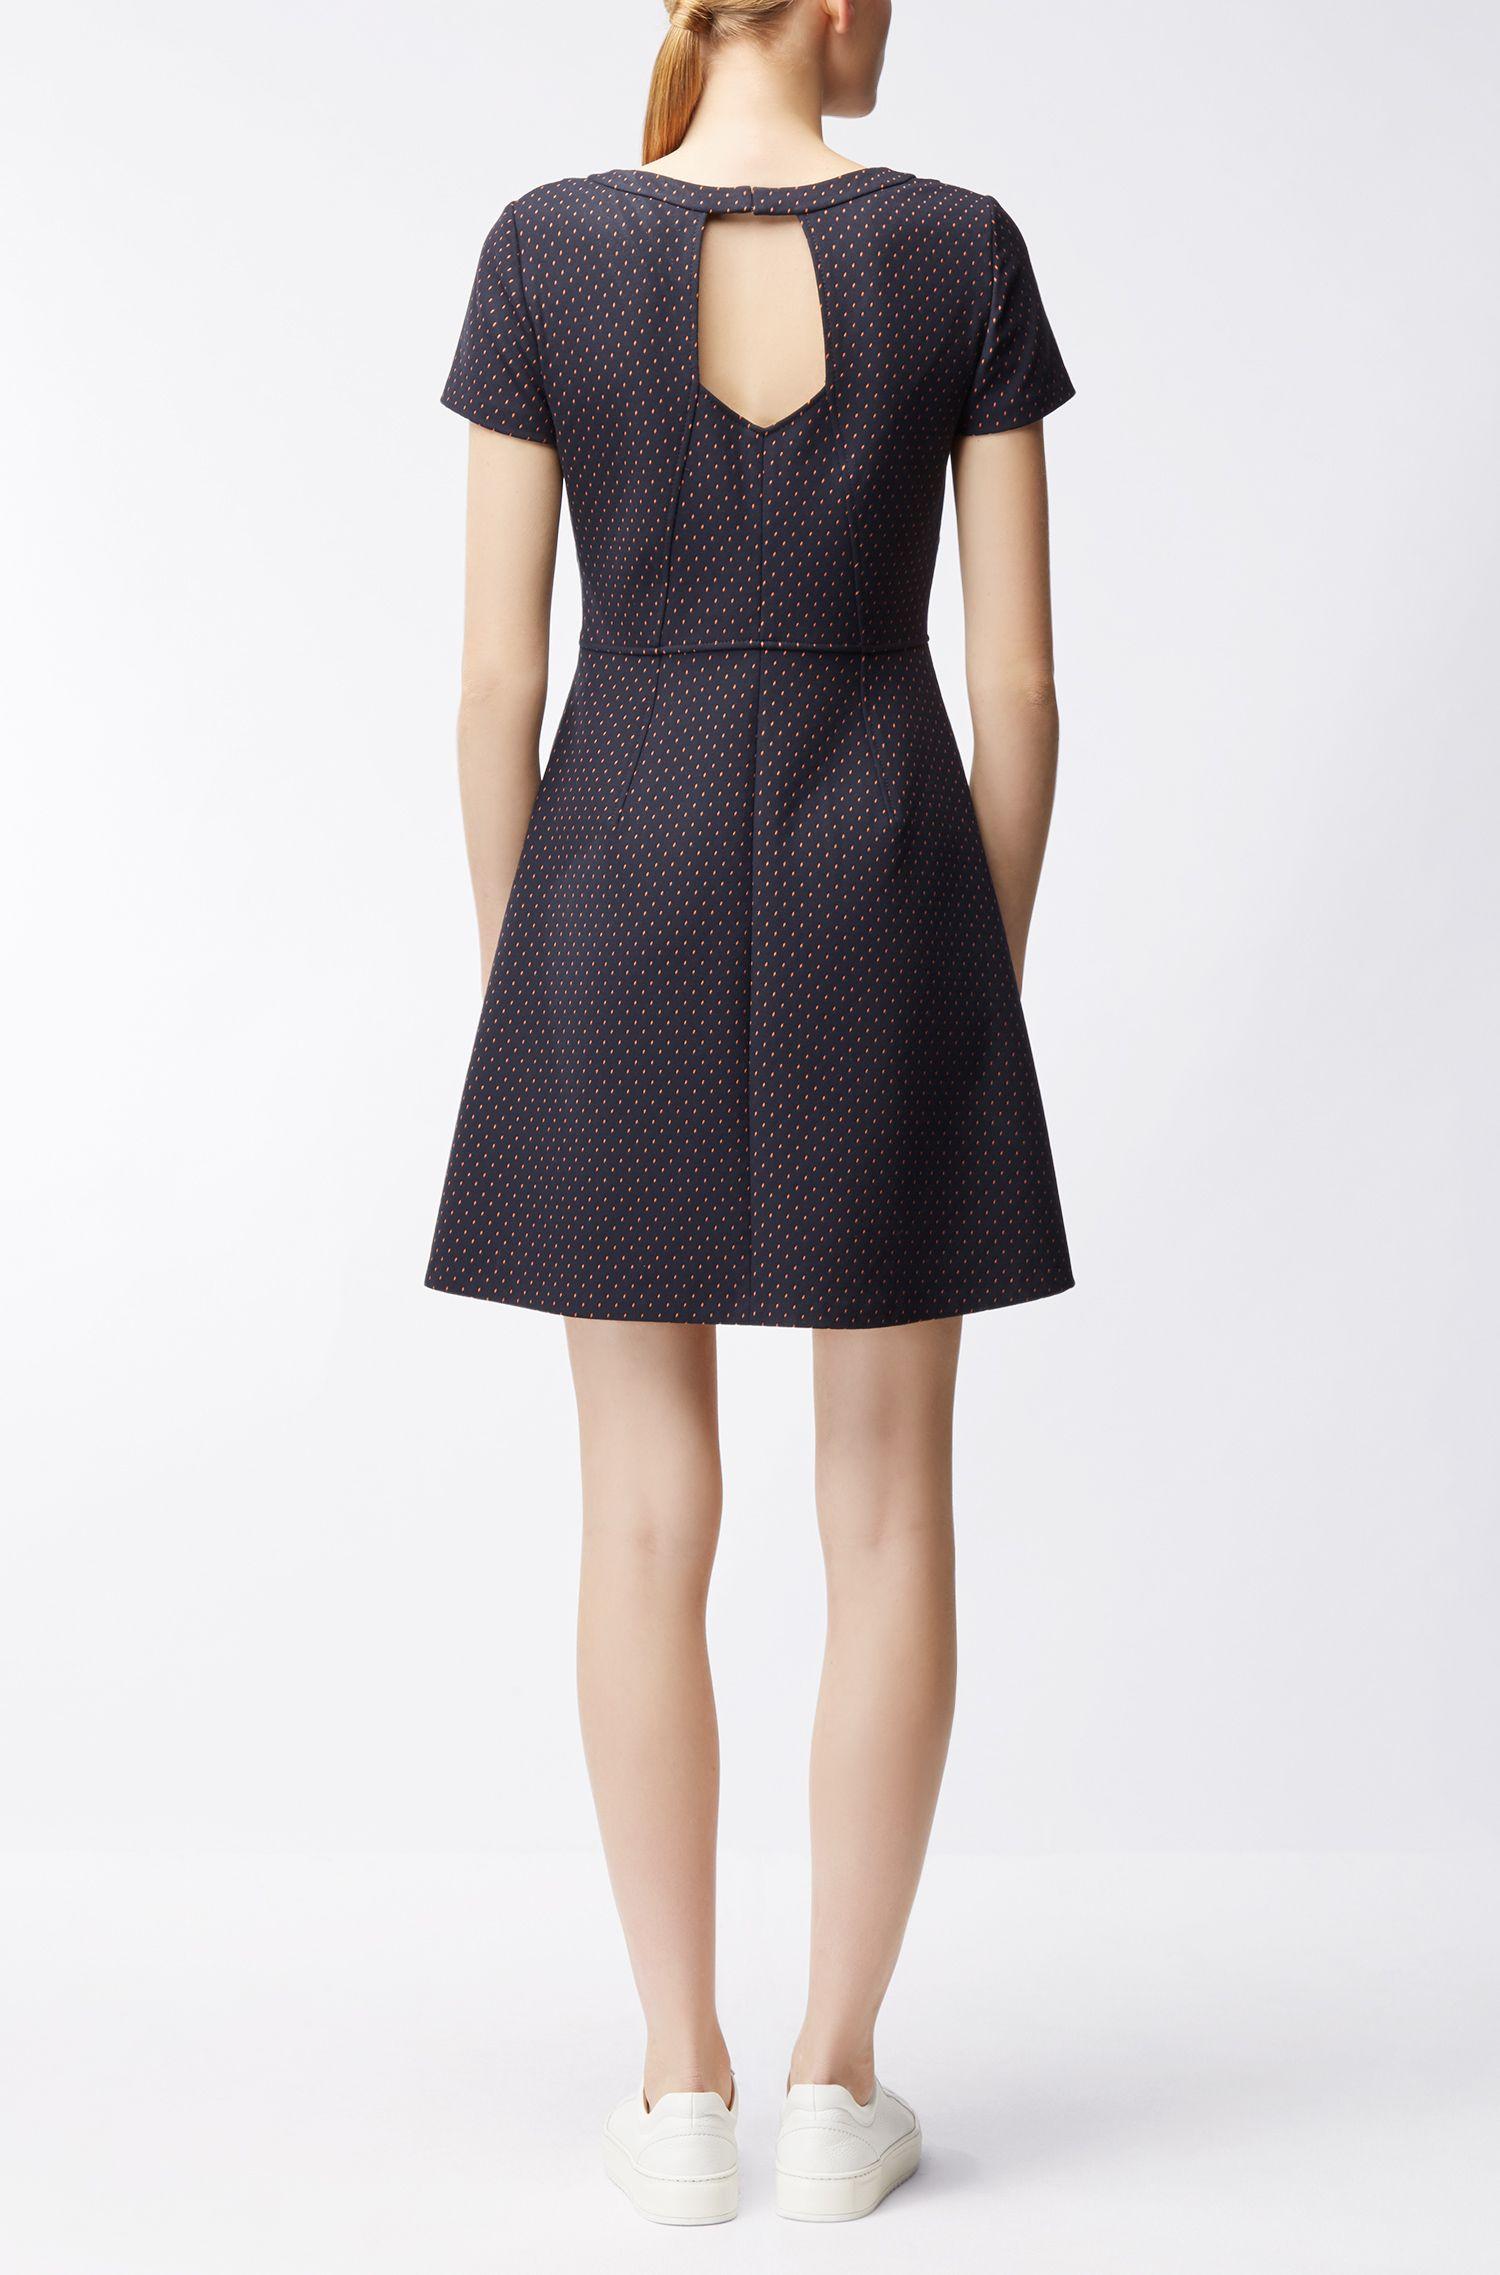 Getailleerde jurk van stretchmateriaal met dessin